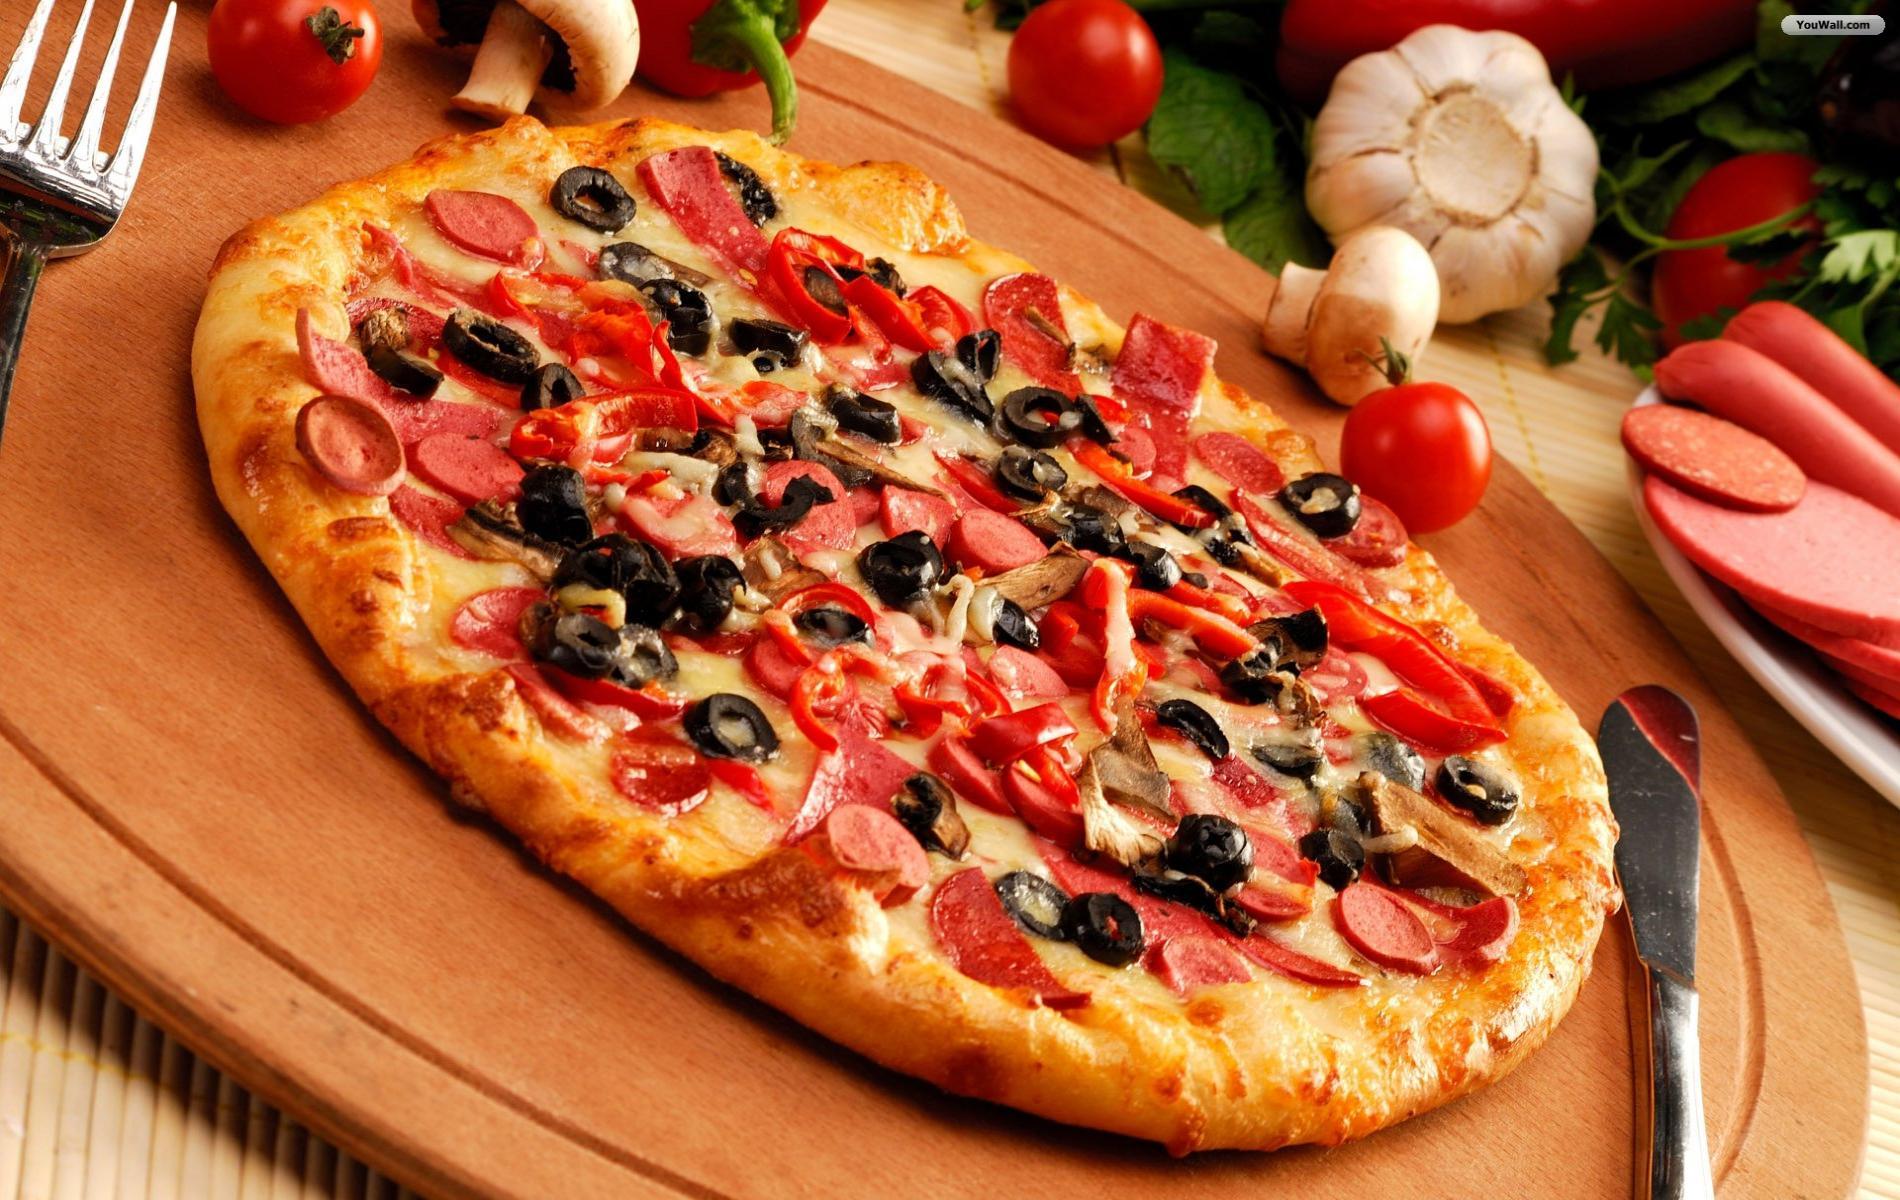 http://pocolocopizza.com/wp-content/uploads/2015/09/yummy_pizza_wallpaper_09983-1900x1200.jpg